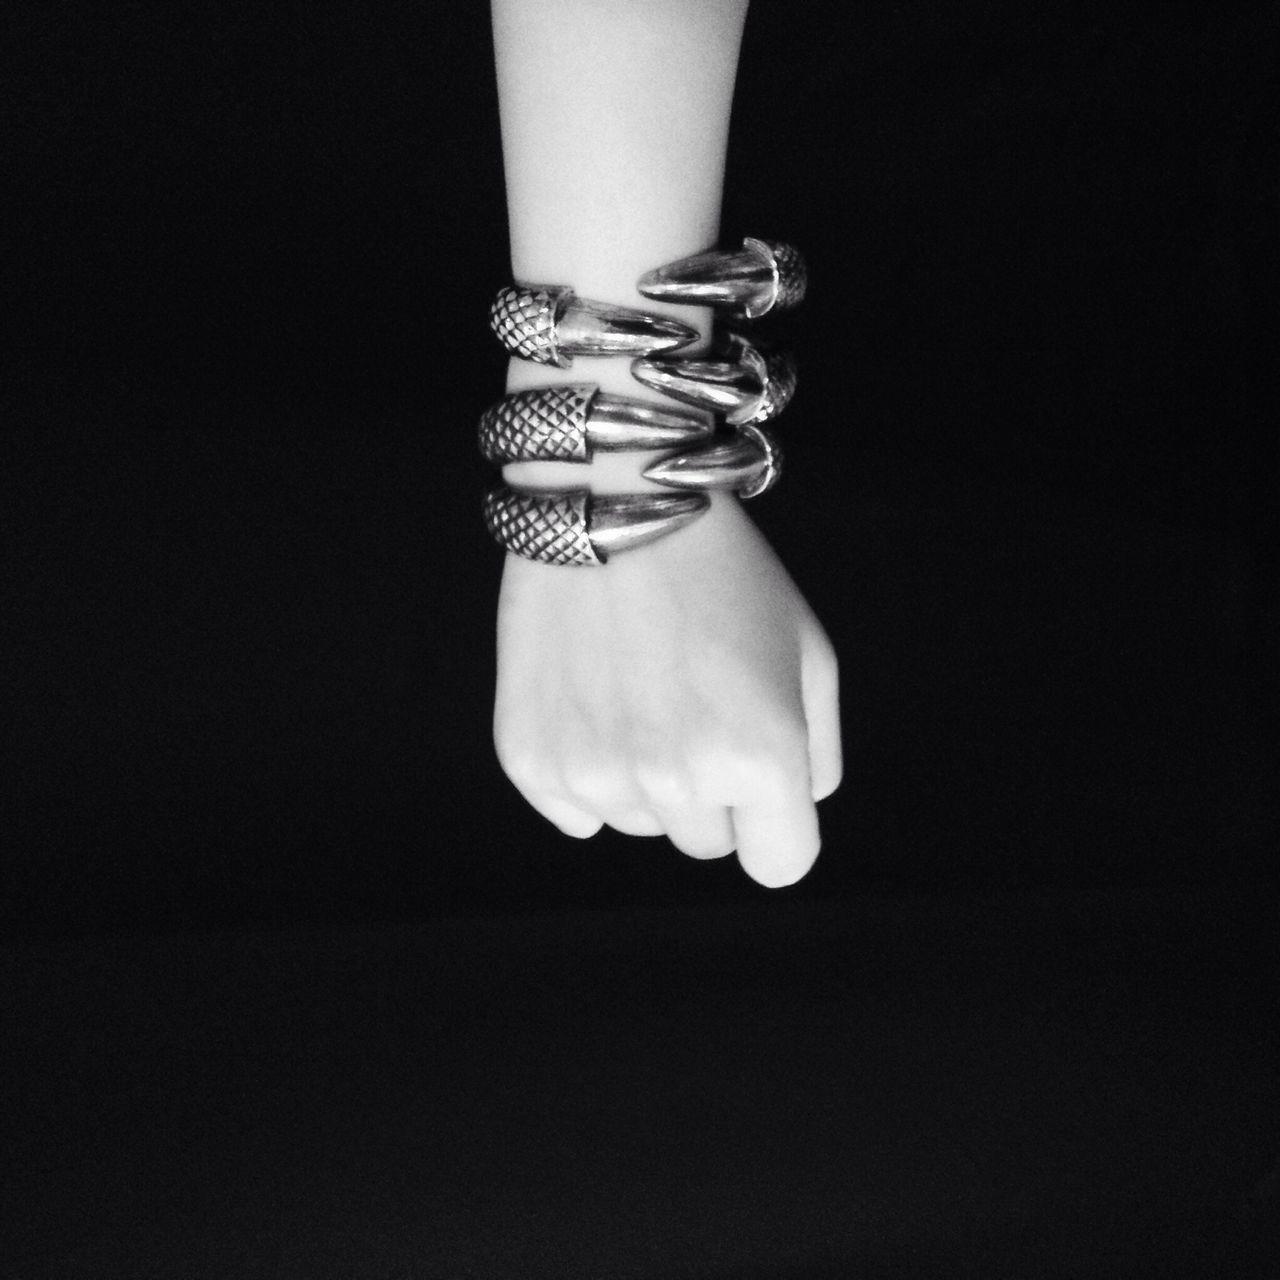 Black & White Minimalism